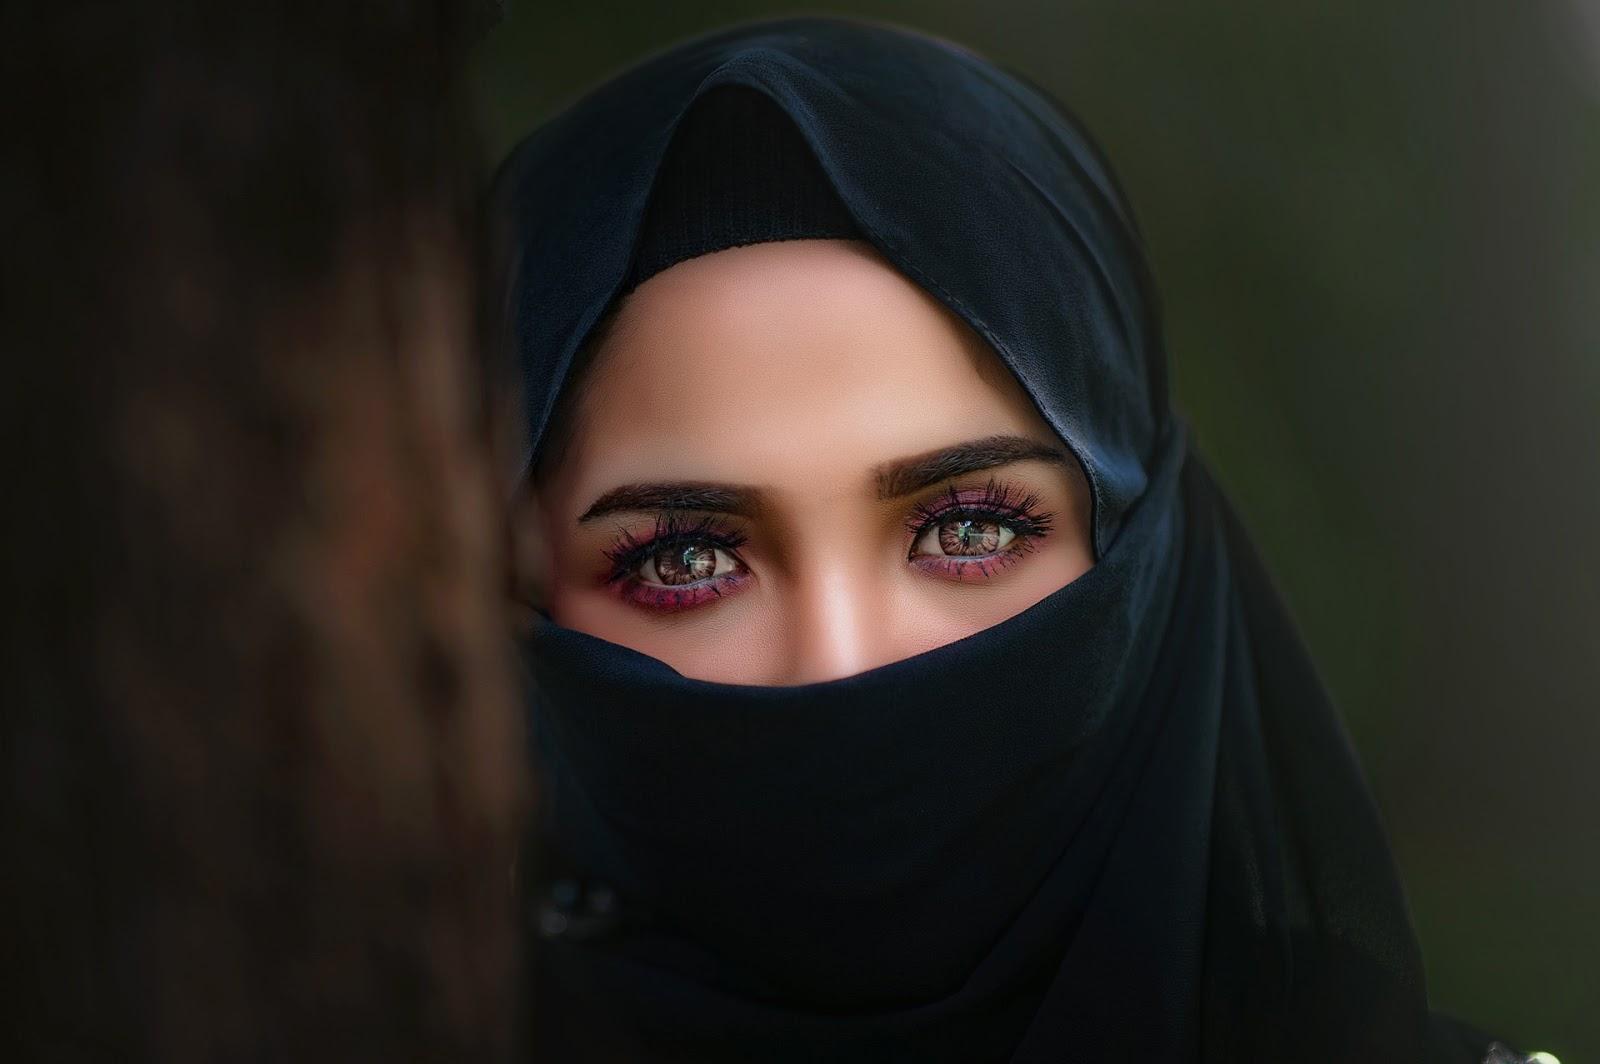 Hijab, Headscarf, Veil, Eyes, Girls, Beauty, Fashion, Women's Fashion,